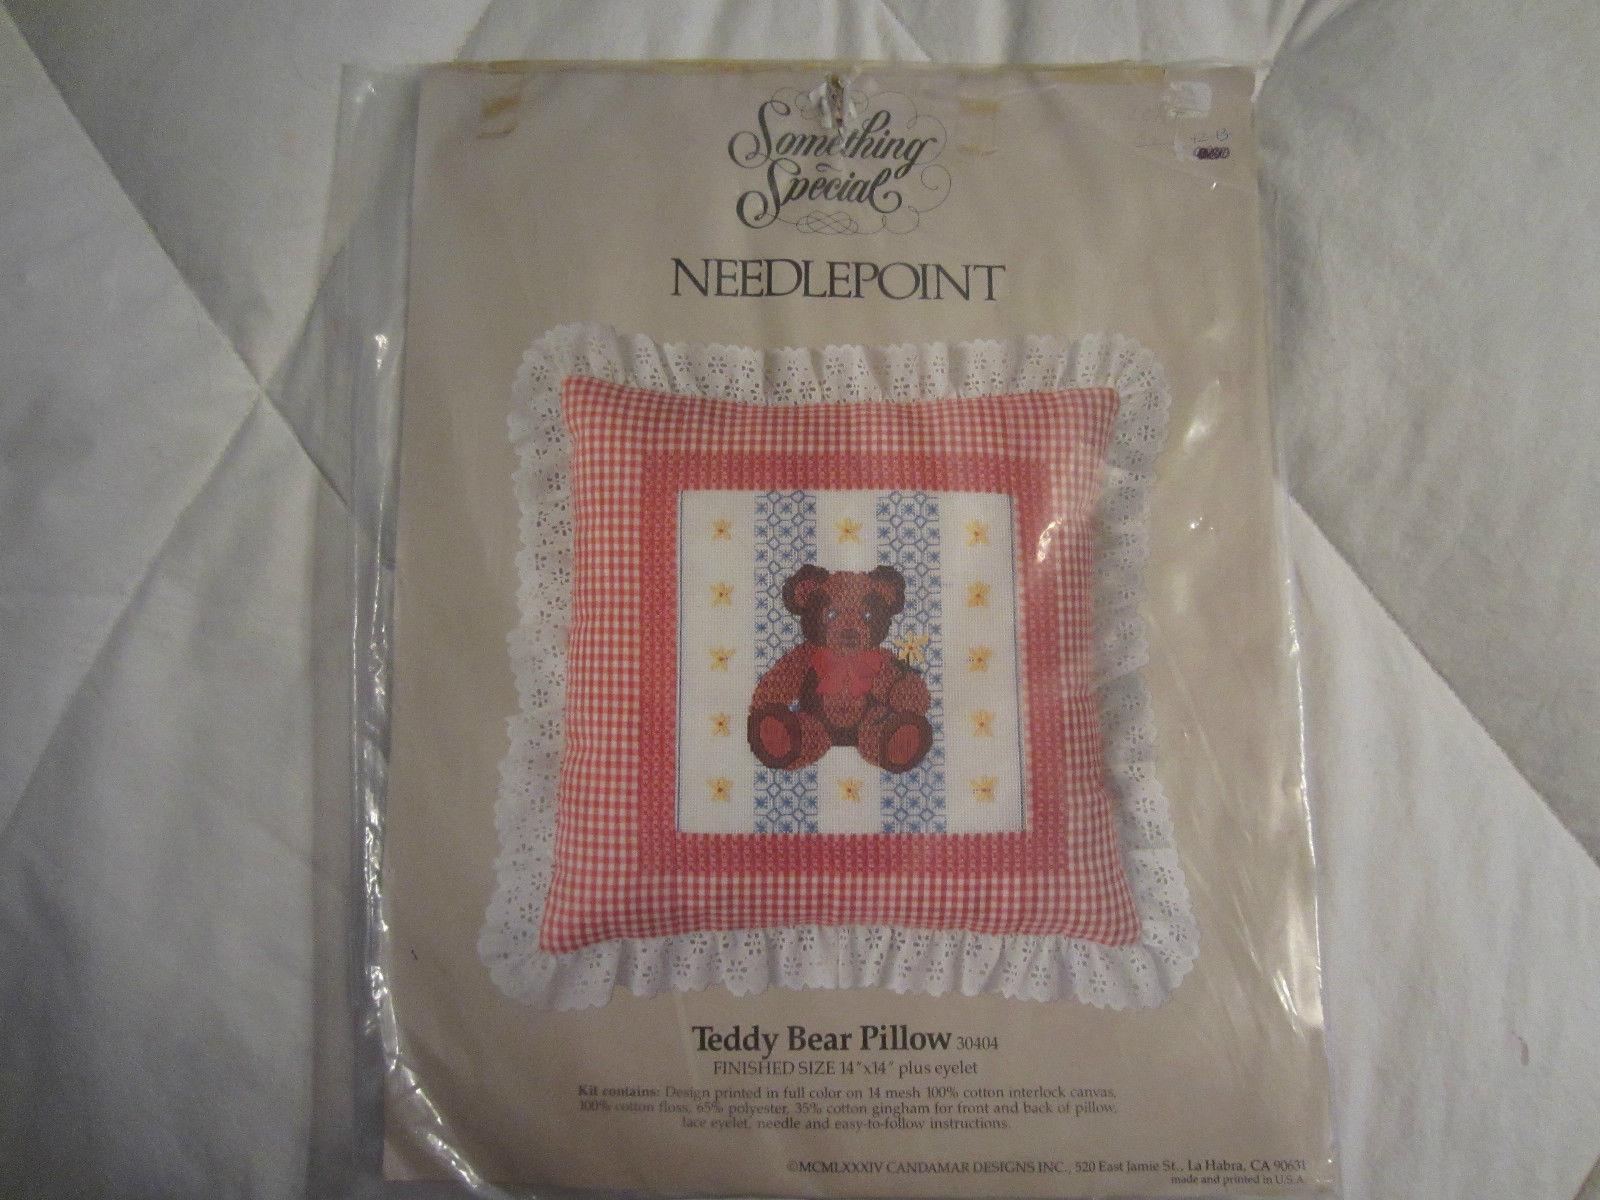 Teddy Bear Pillow Vtg 1980s Needlepoint Kit CandaMar Designs - $22.00